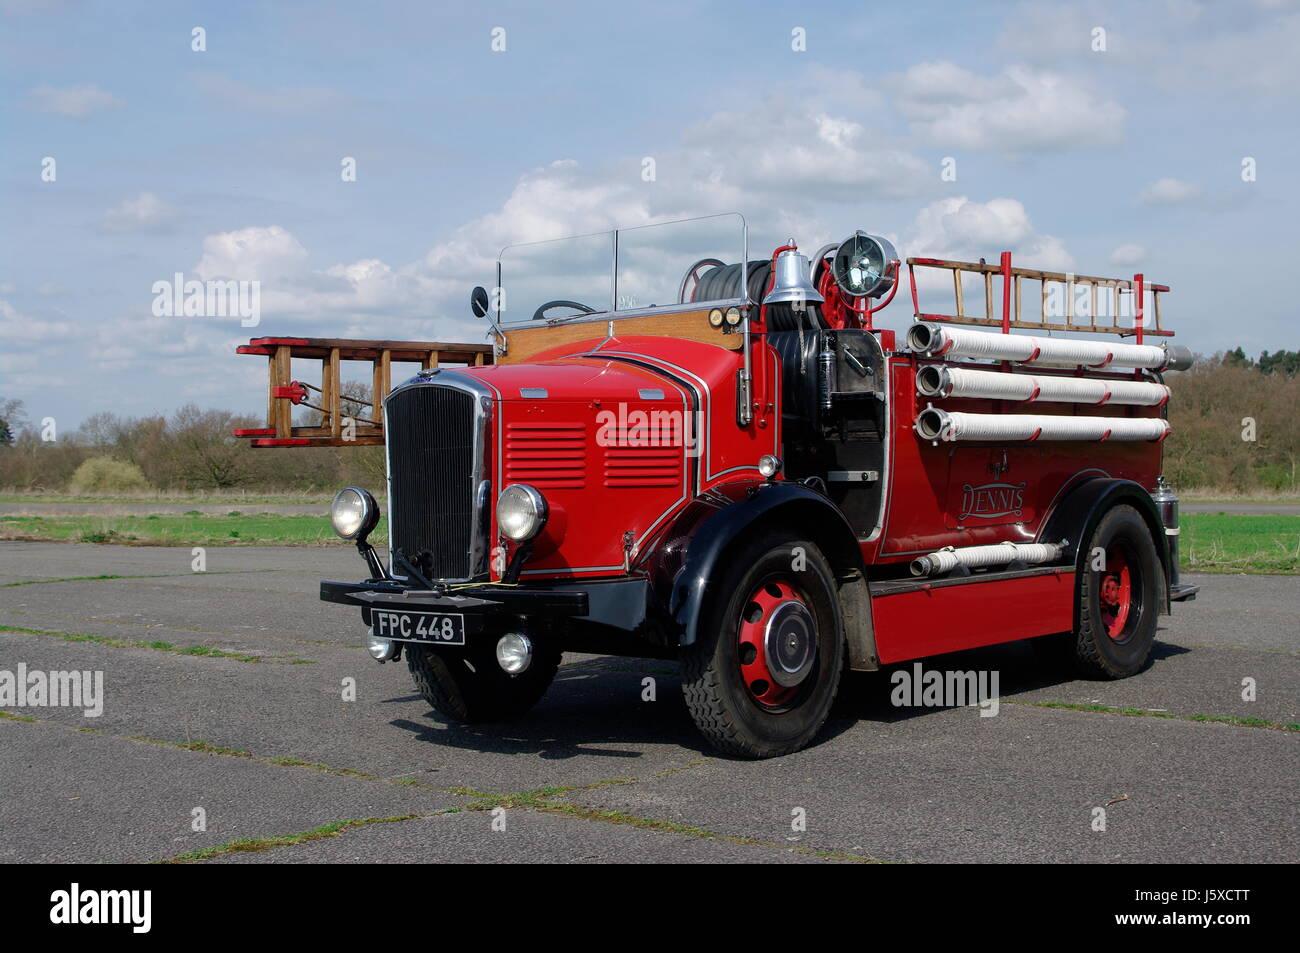 1936 Dennis Ace Fire Engine - Stock Image